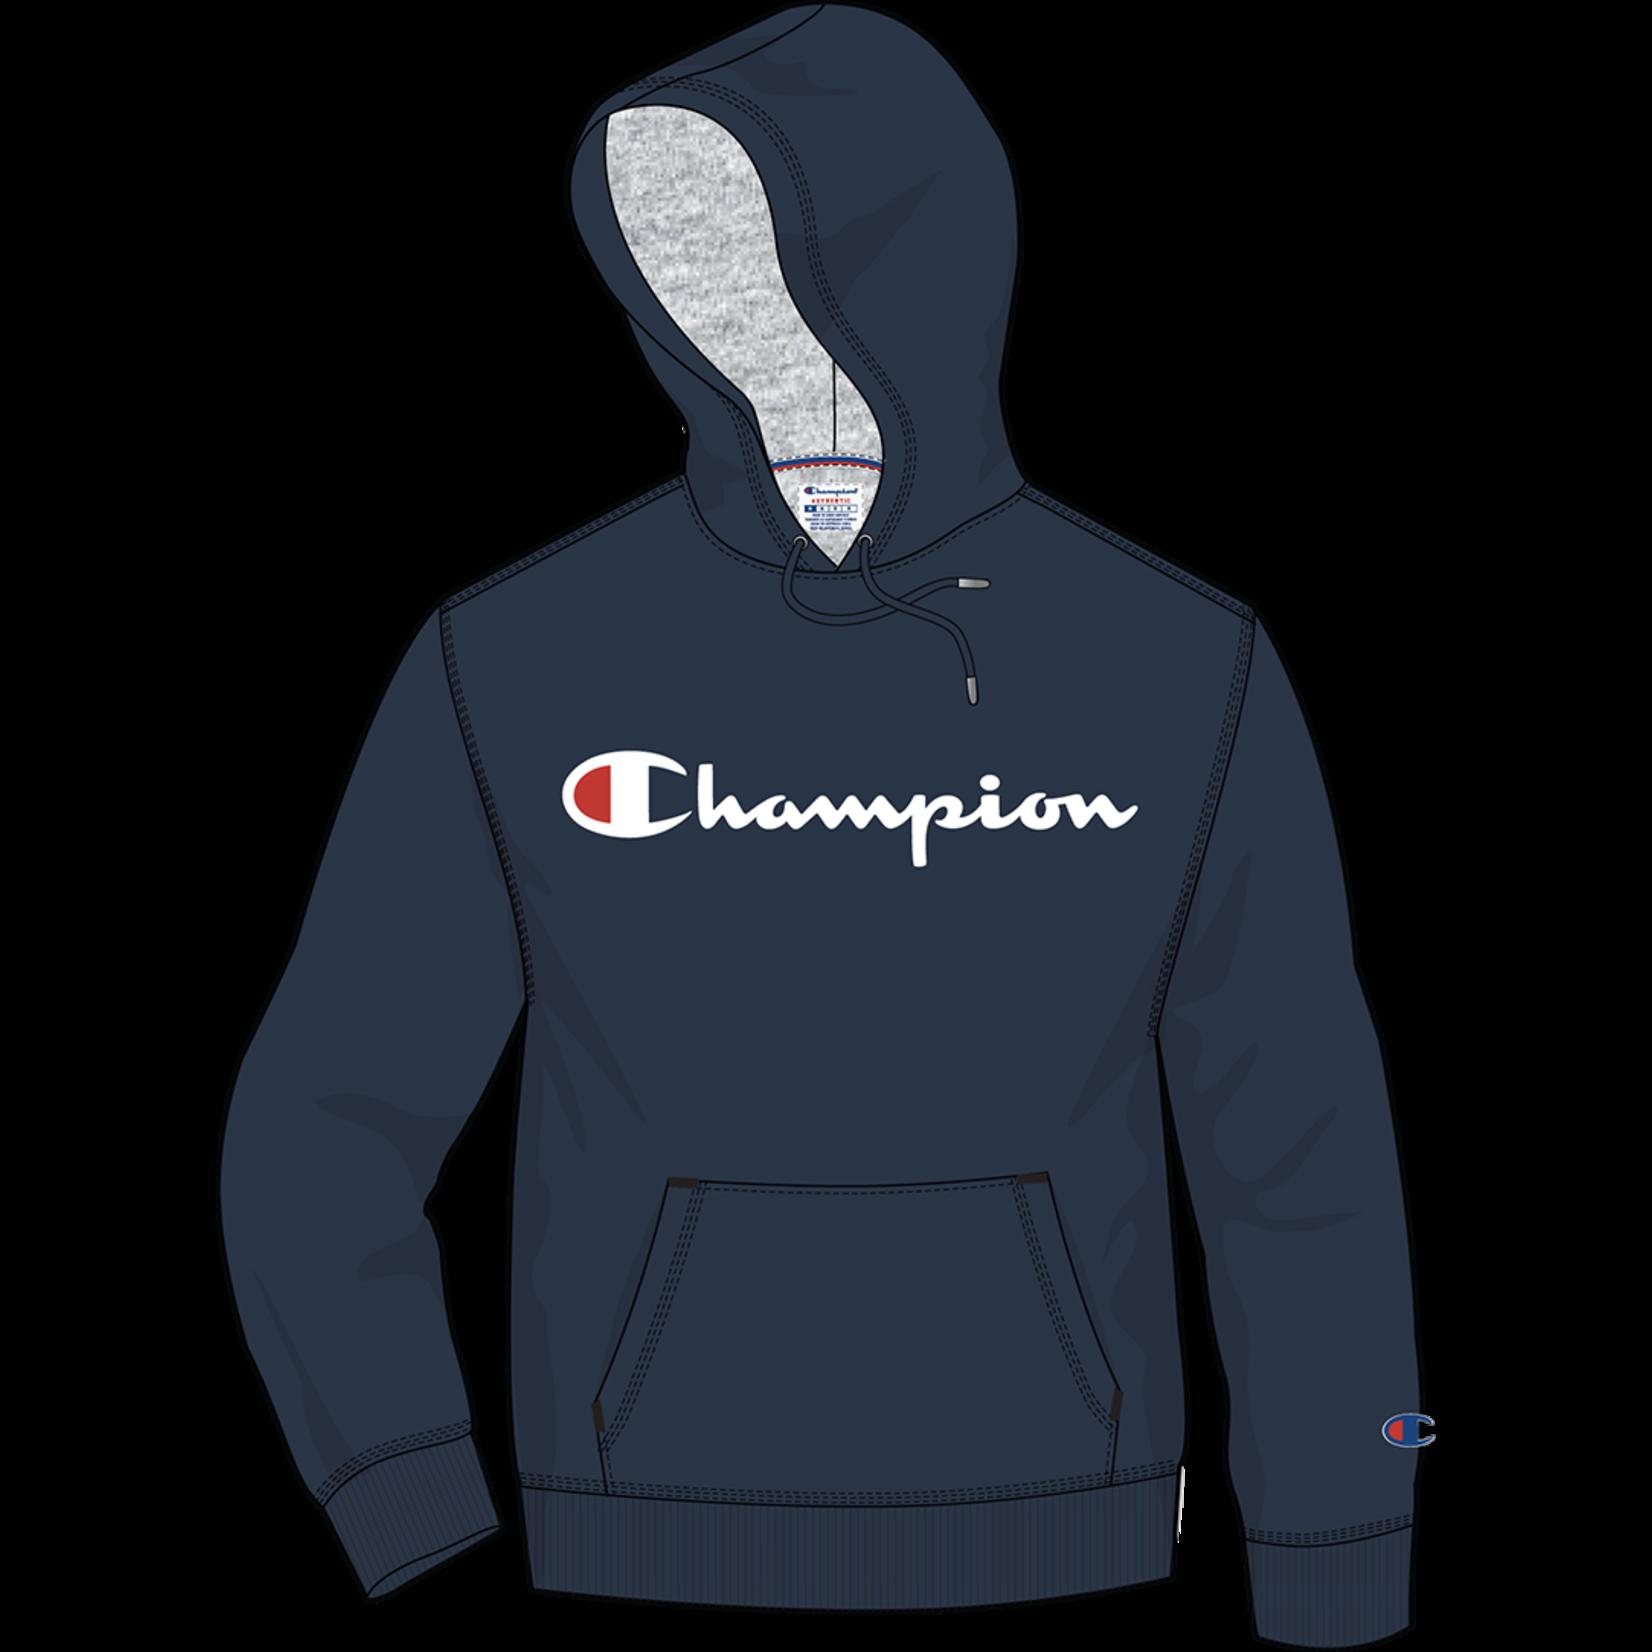 Champion Champion Hoodie, Powerblend Graphic, Mens